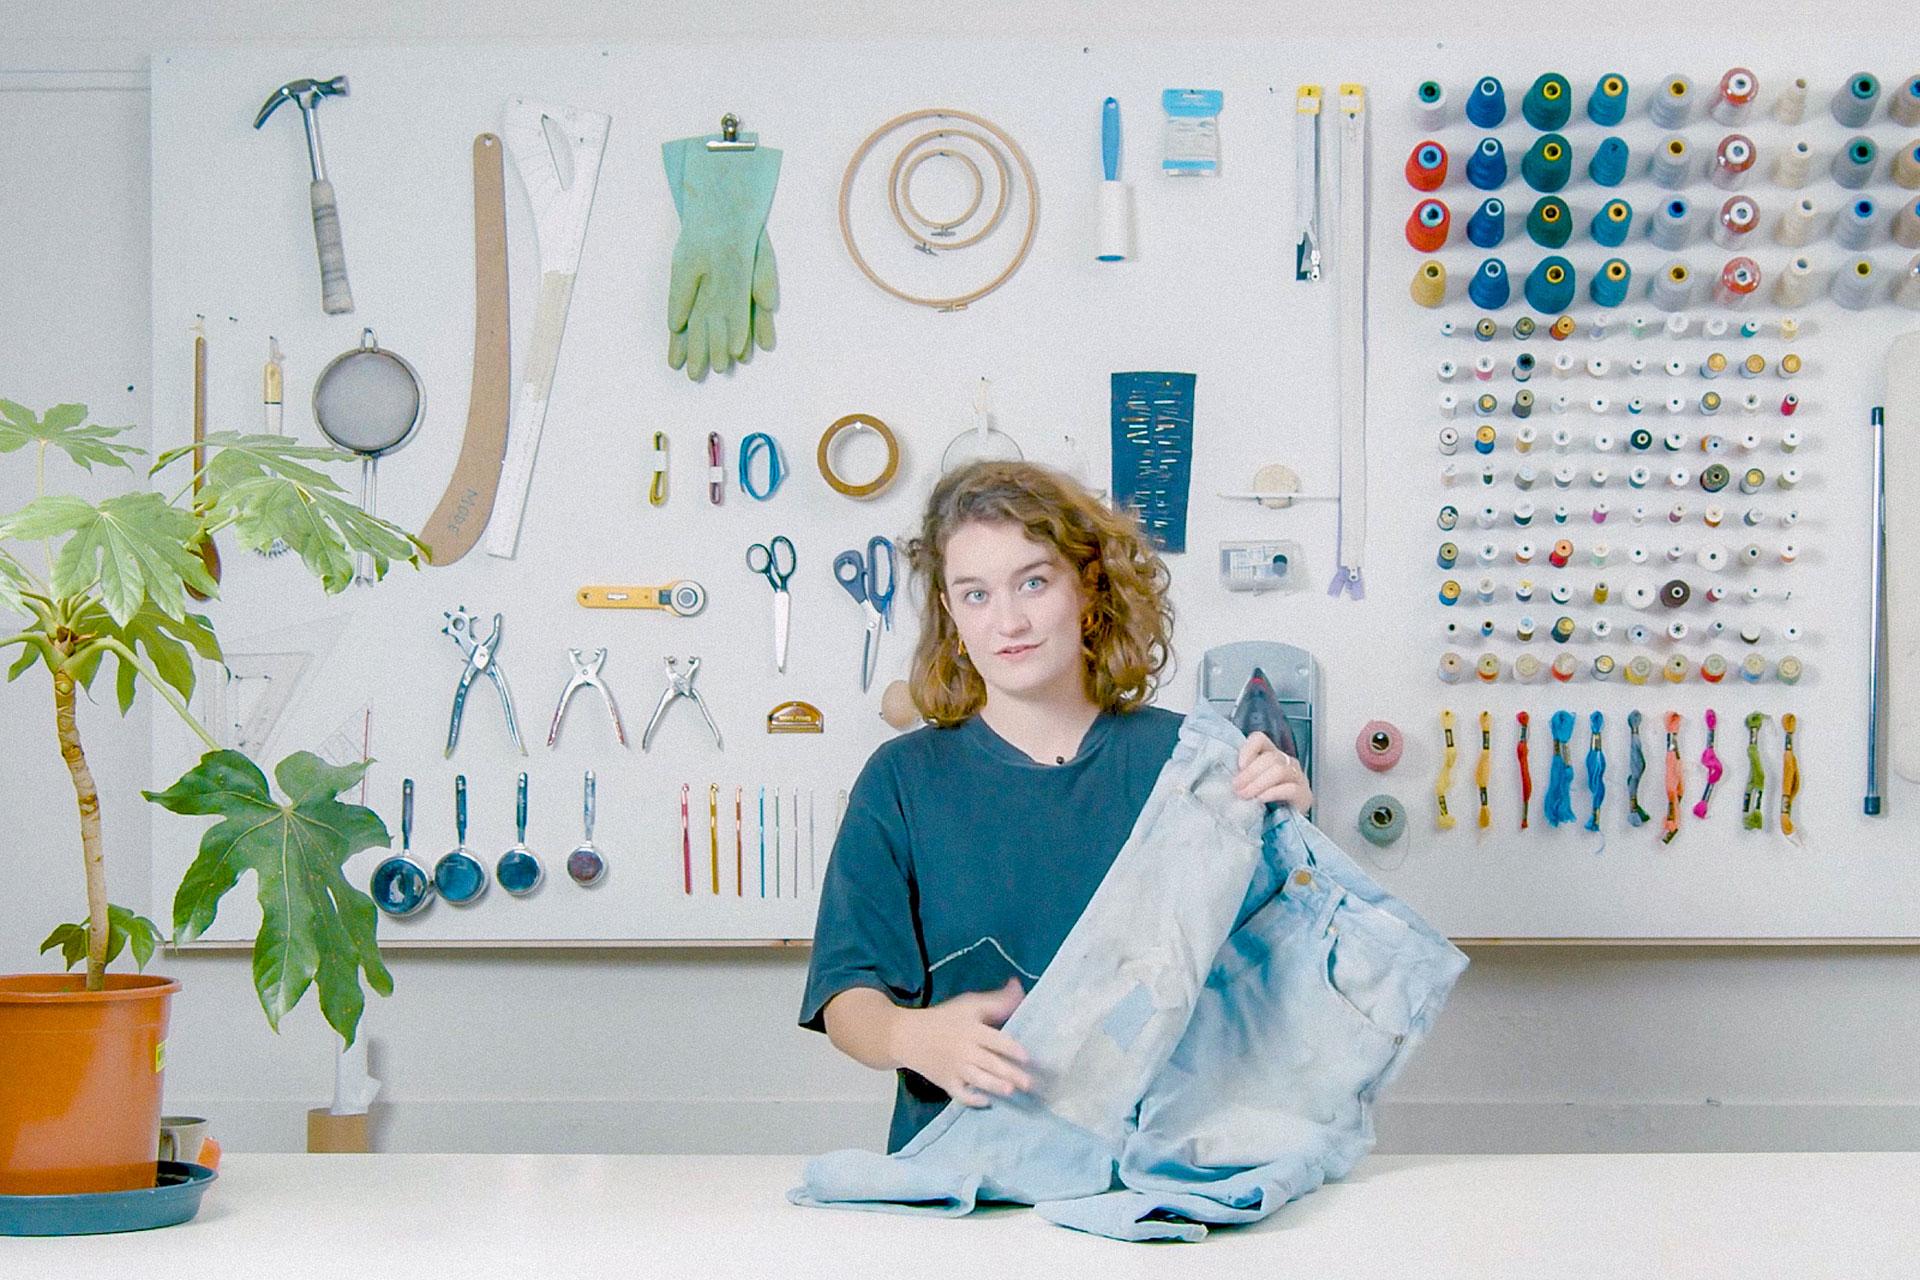 Woman explaining how to repair things